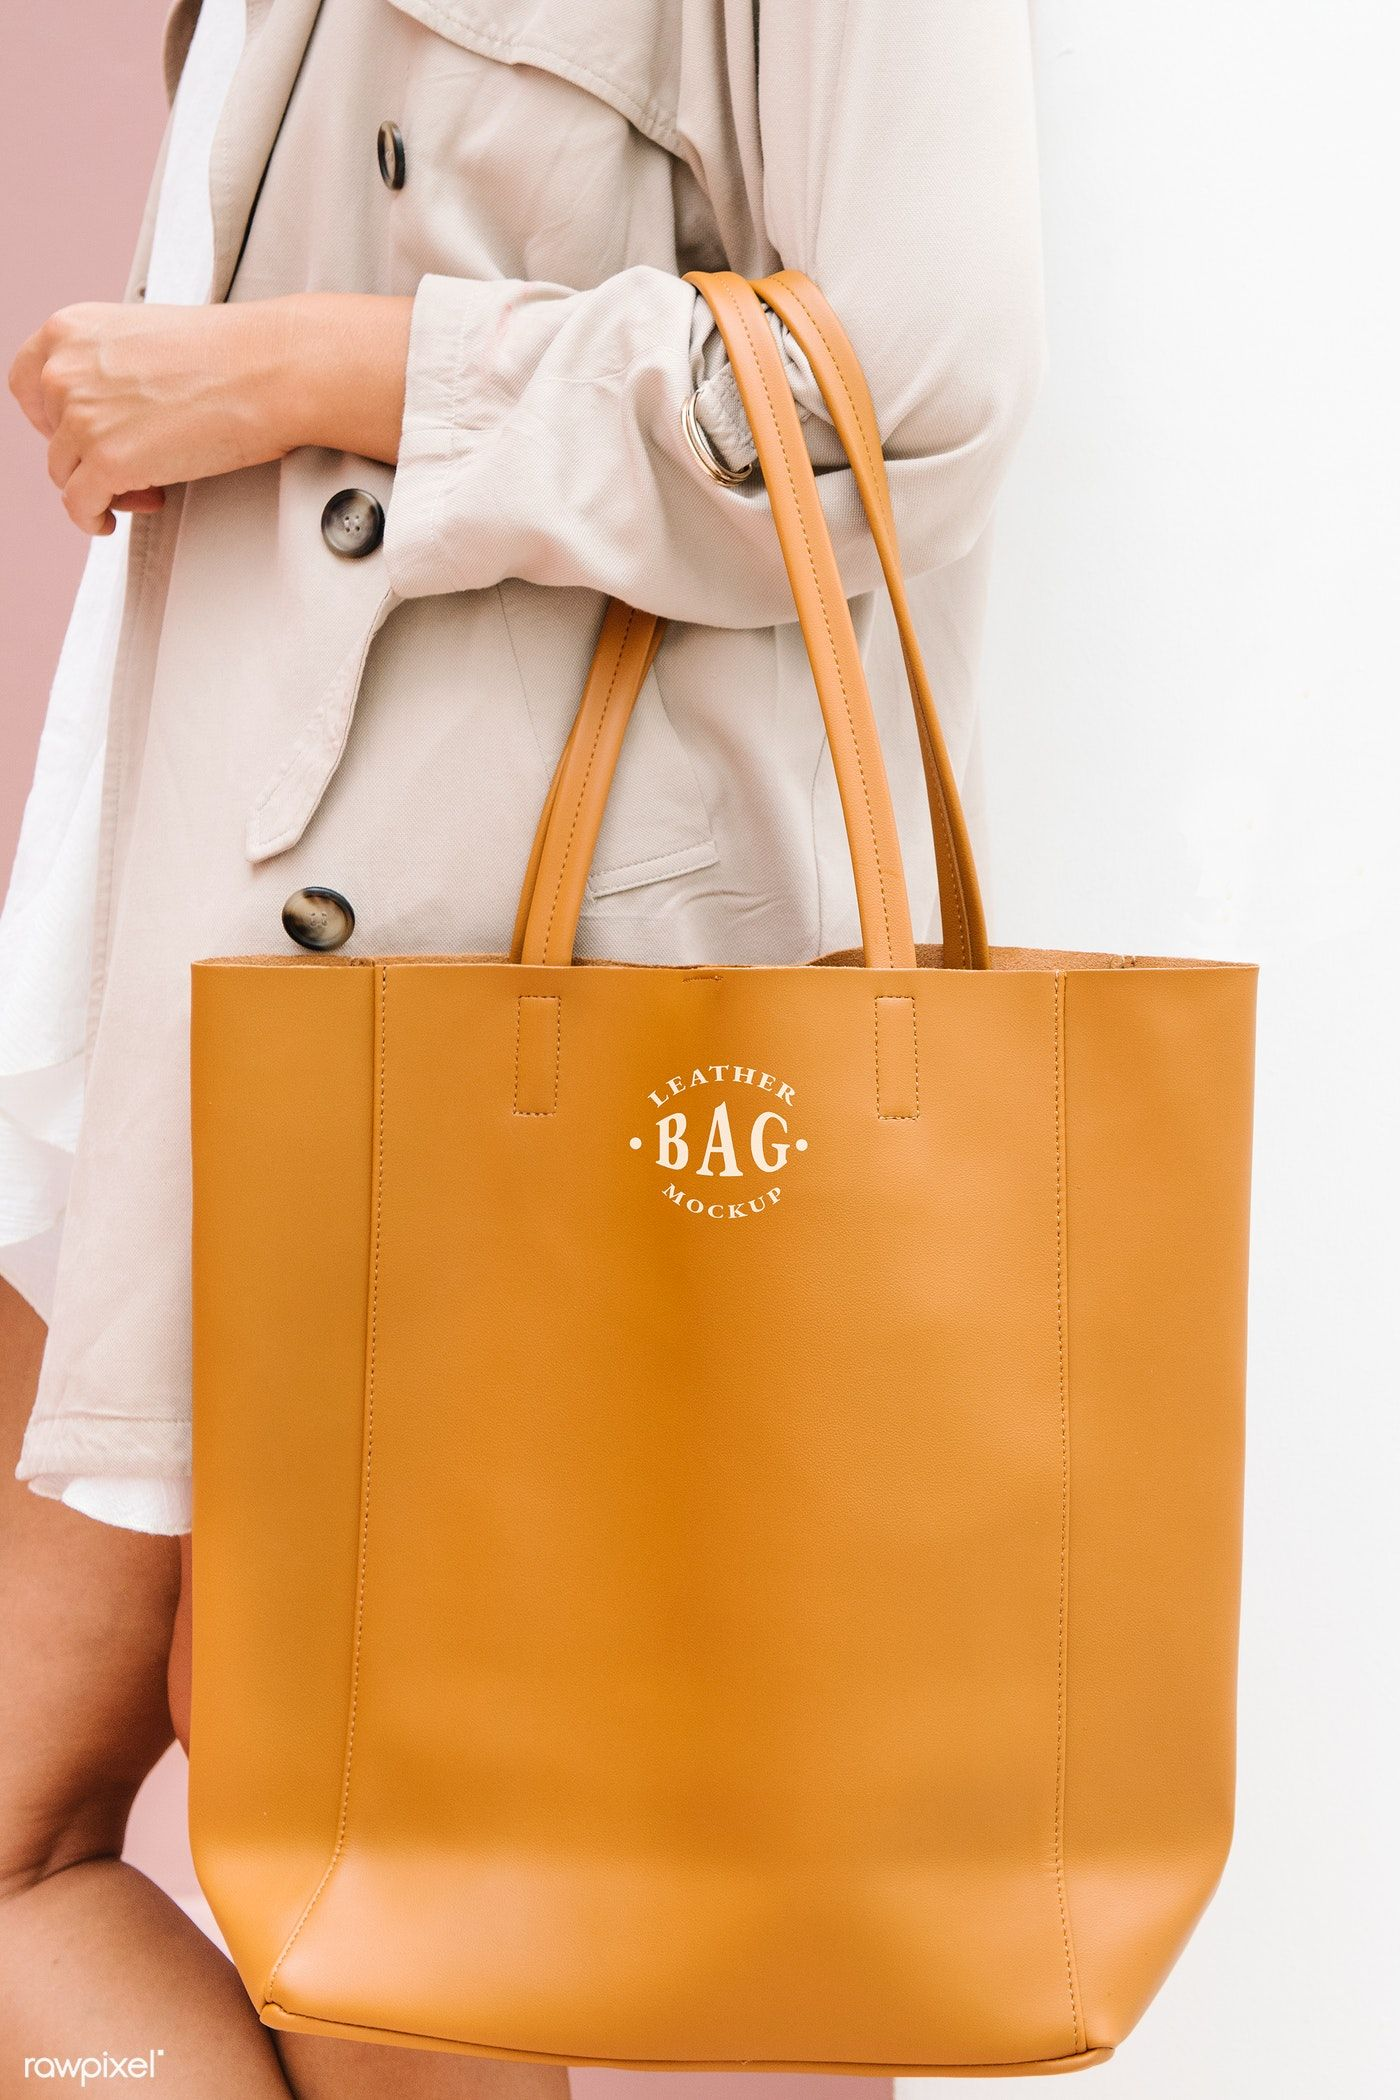 Download Download Premium Psd Of Woman Carrying A Brown Handbag Mockup 1215249